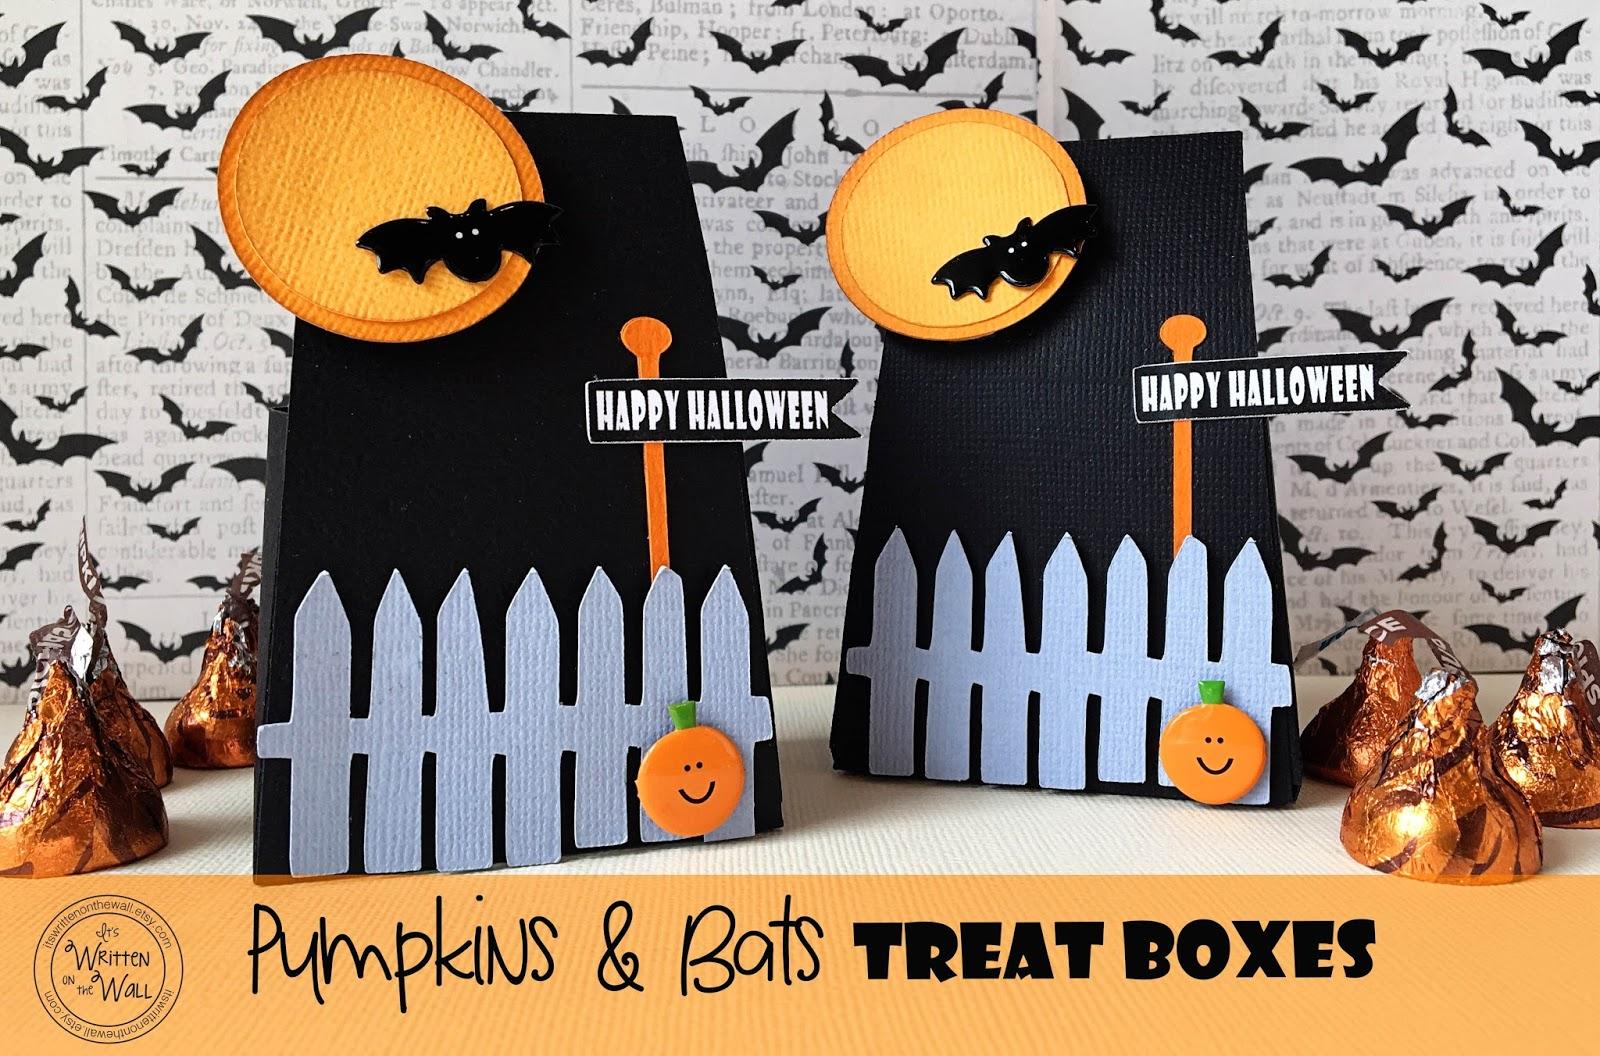 Halloween Londra.It S Written On The Wall Halloween Moonlight Bats Treat Boxes